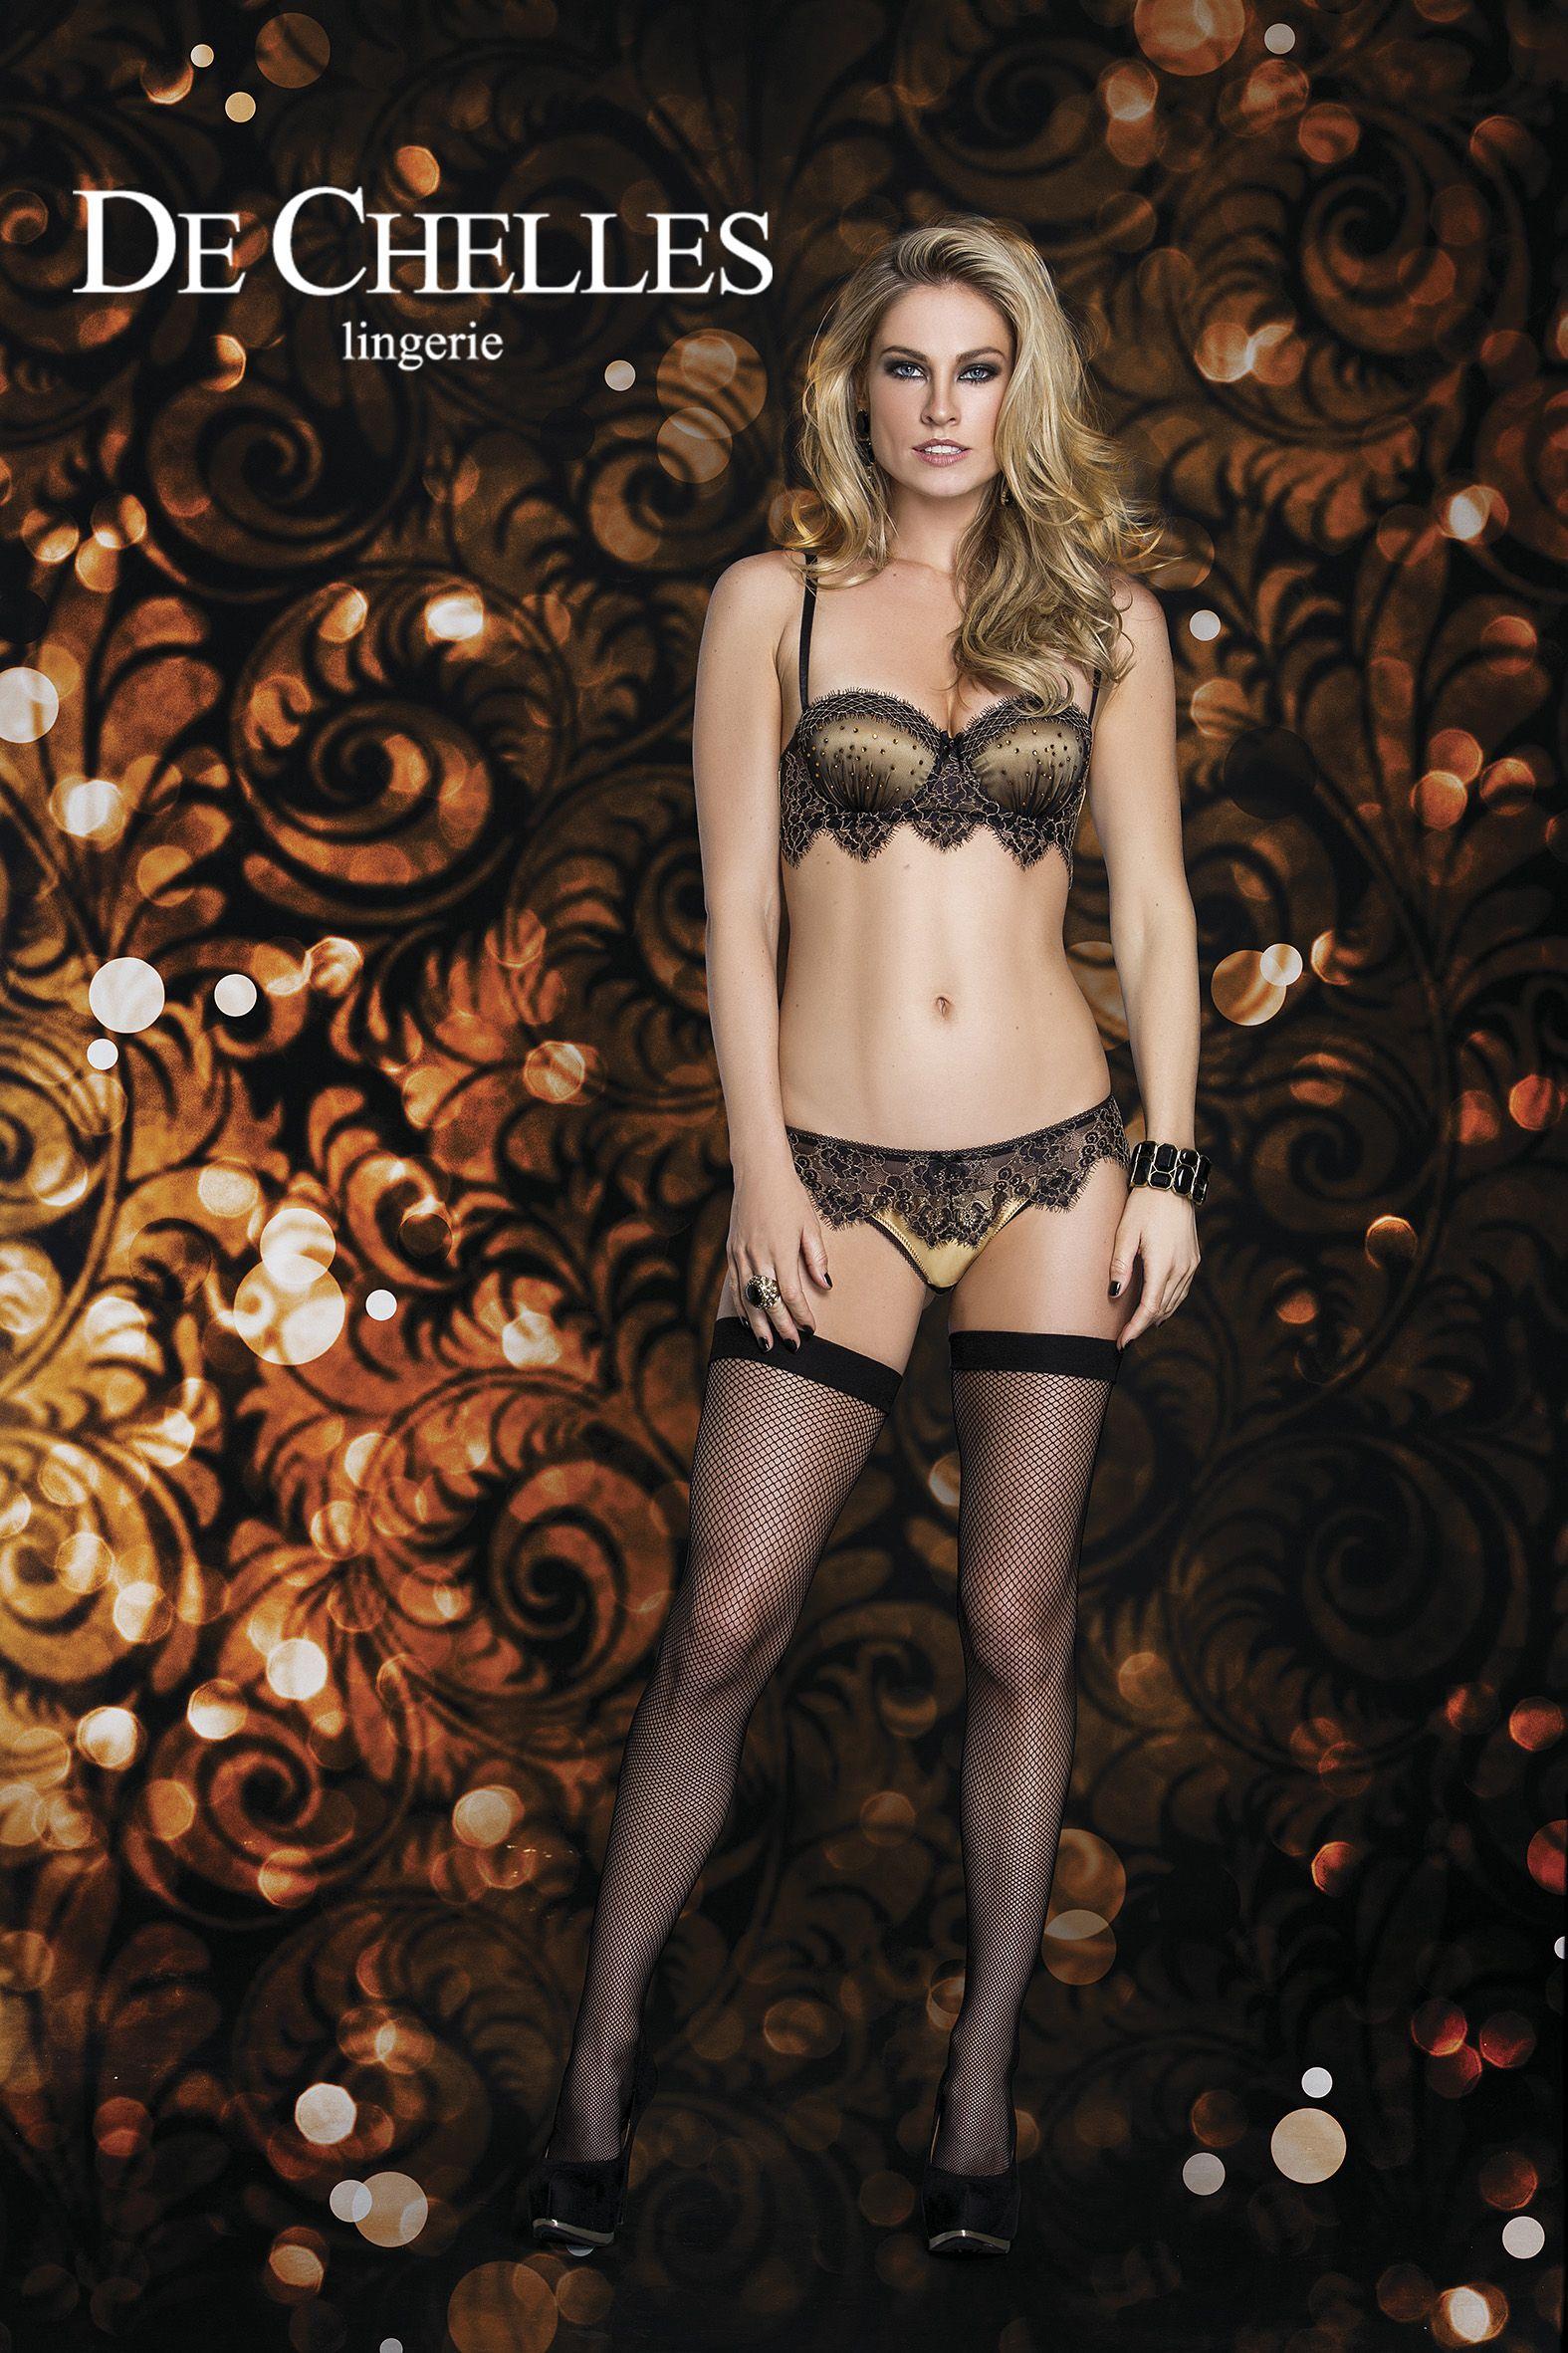 a36992fe4 lingerie  modaíntima  nightwear  fashion vendas dechelles.com.br ...